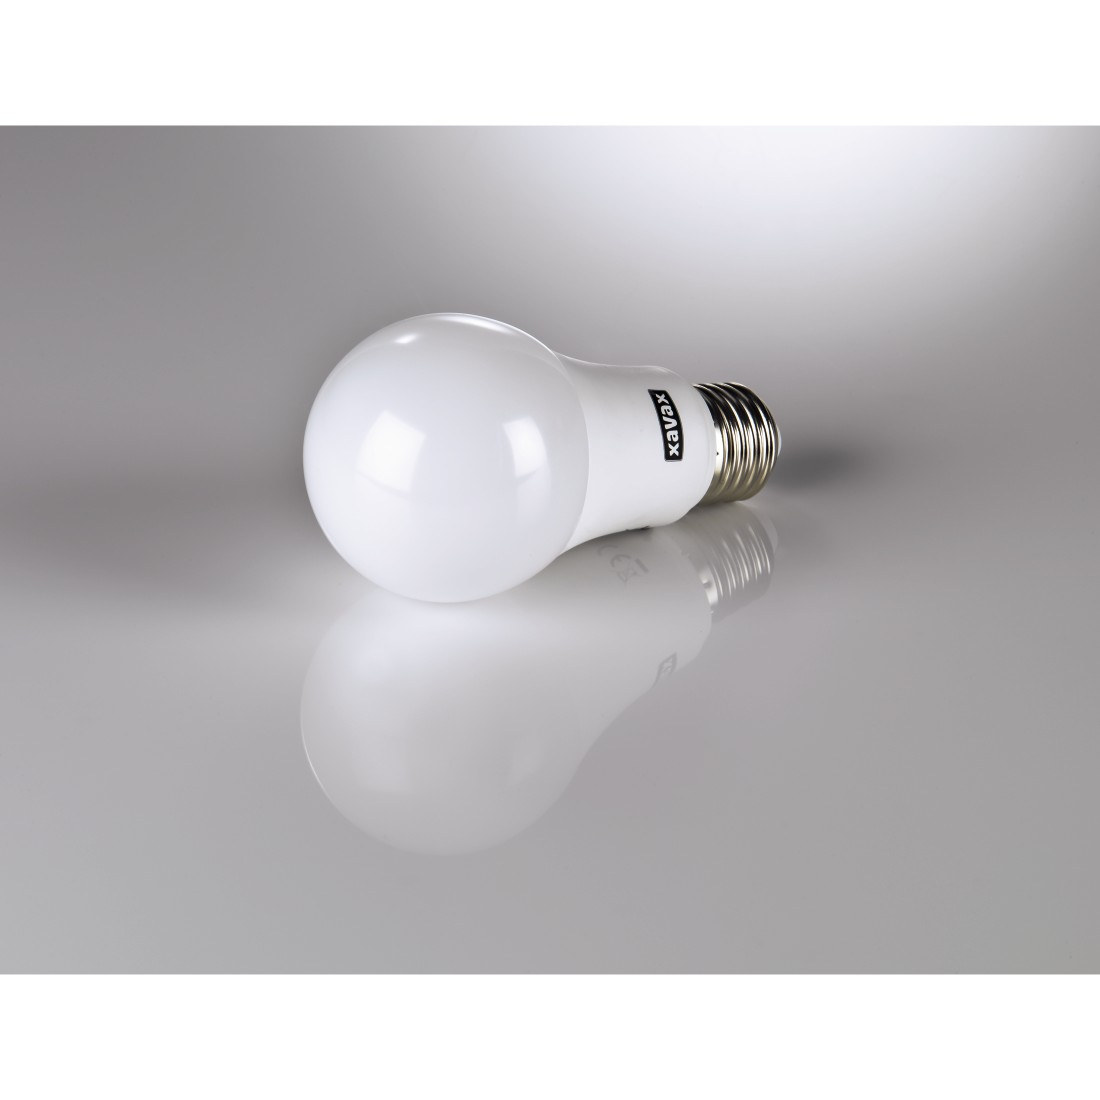 Xavax 00112198 xavax led lampe e27 806lm ersetzt 60w abx3 druckfhige abbildung 3 xavax led lampe e27 806lm ersetzt 60w parisarafo Images